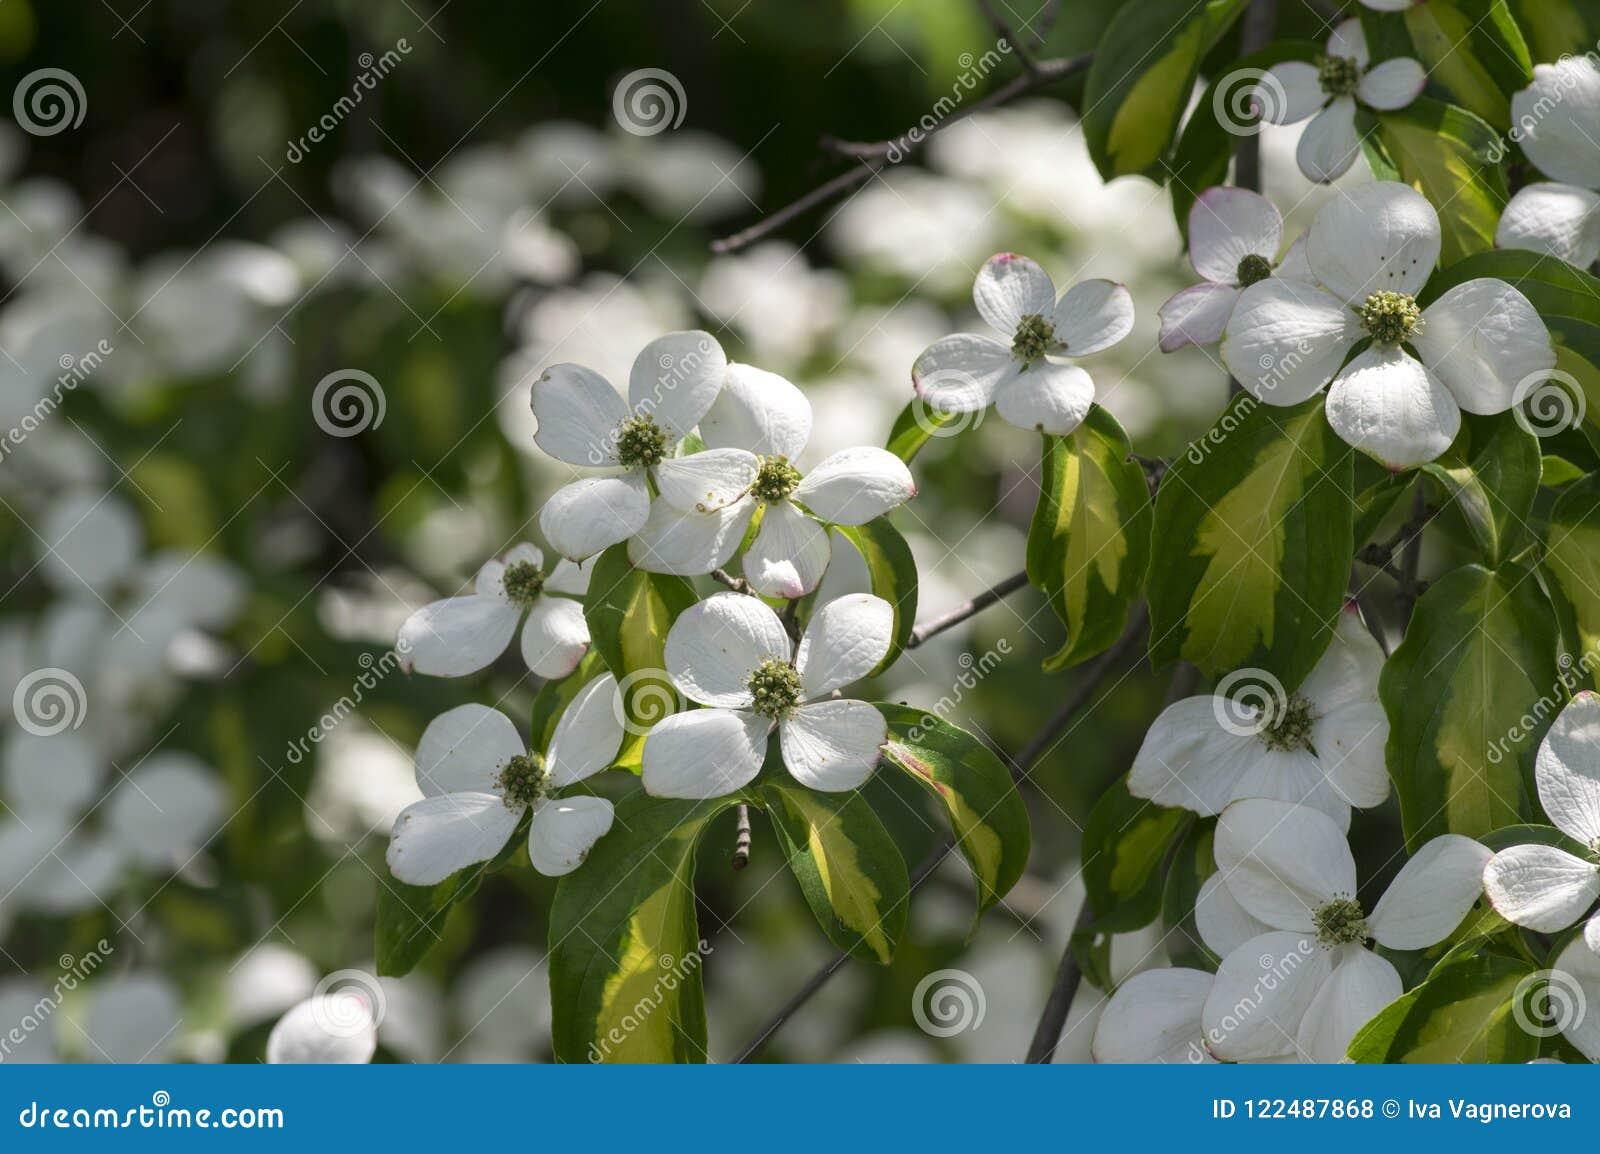 Cornus Kousa Ornamental And Beautiful Flowering Shrub Bright White